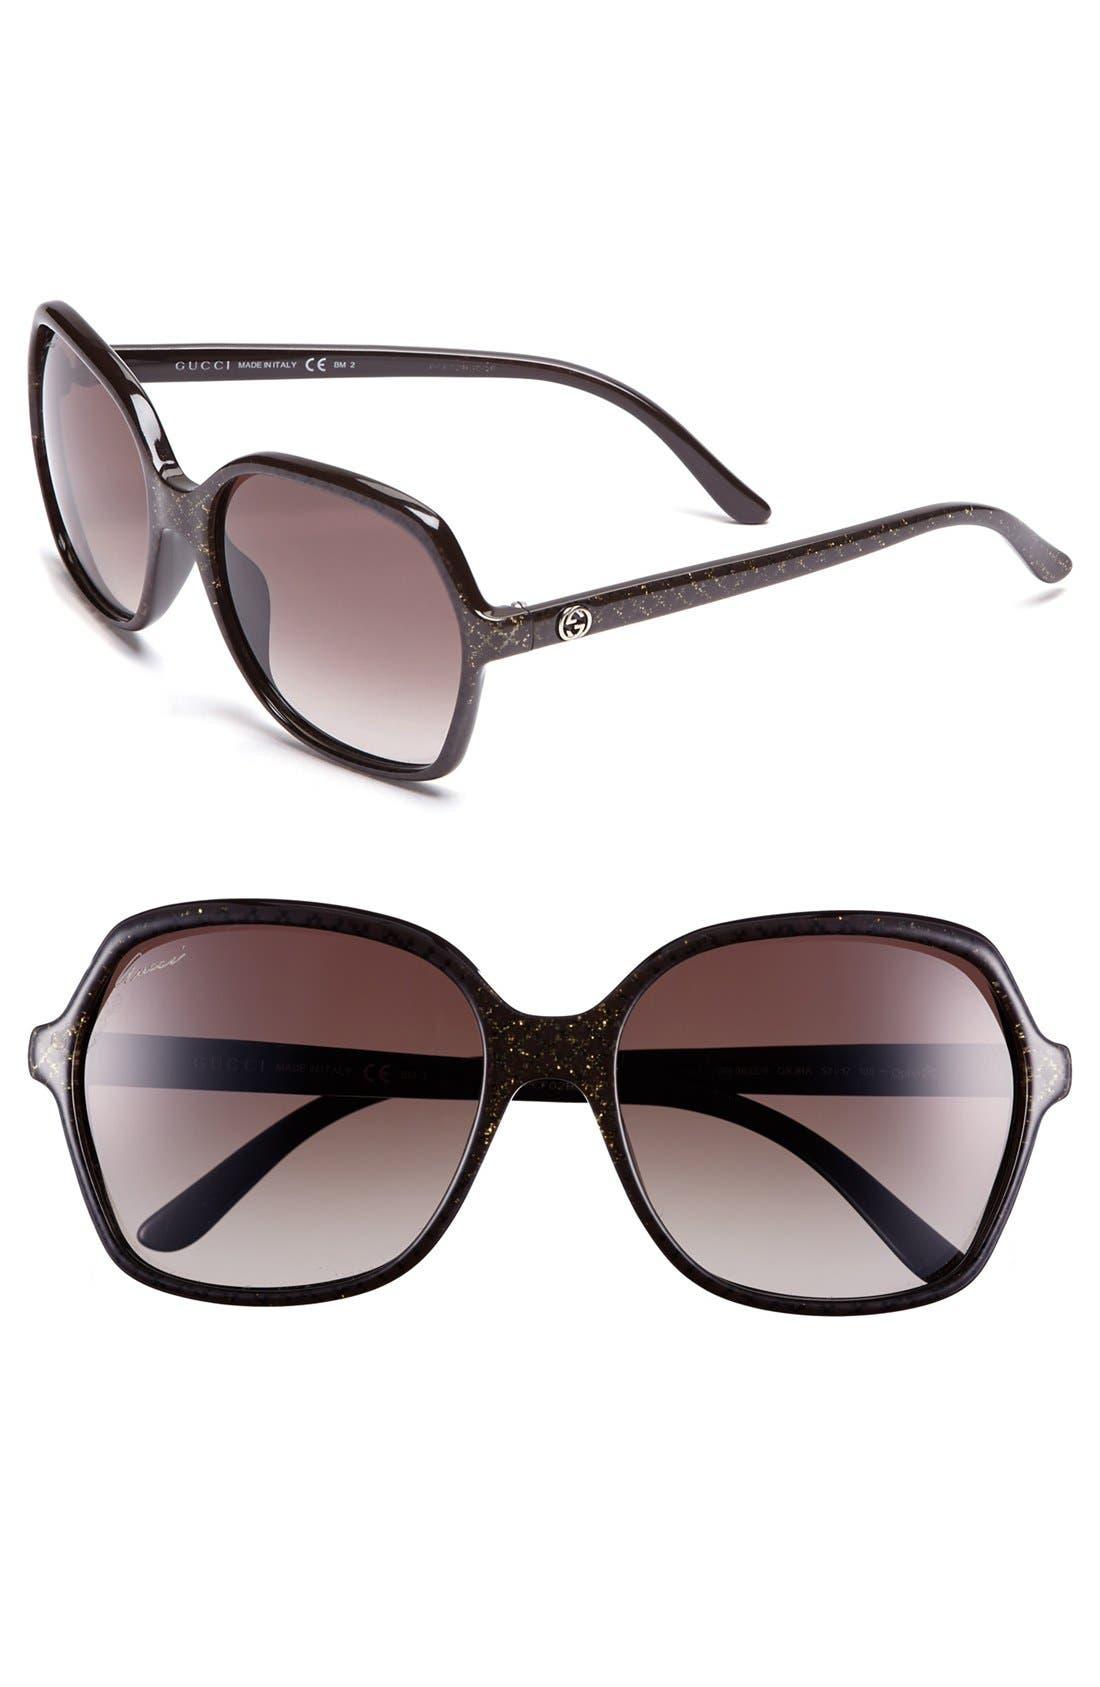 Main Image - Gucci 'Basic' 57mm Sunglasses